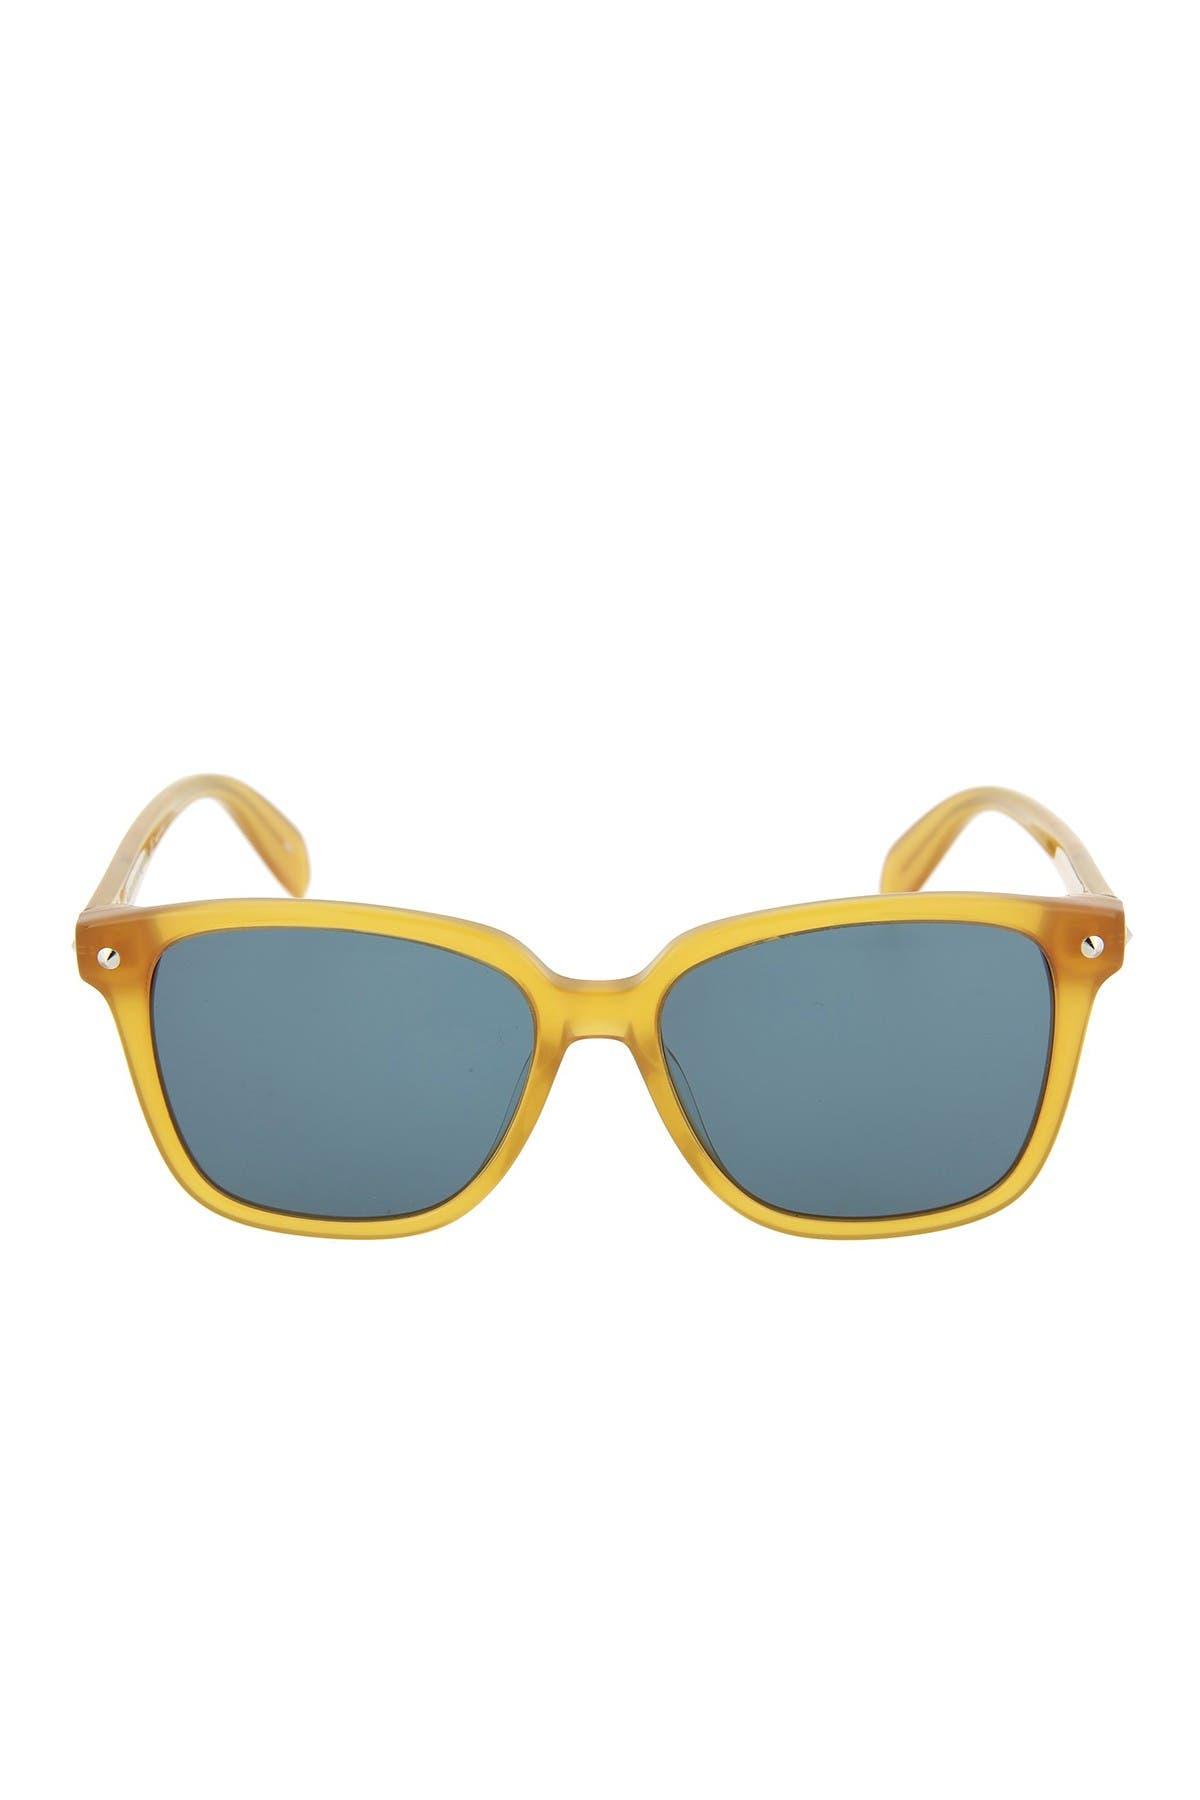 Image of Alexander McQueen 53mm Square Sunglasses